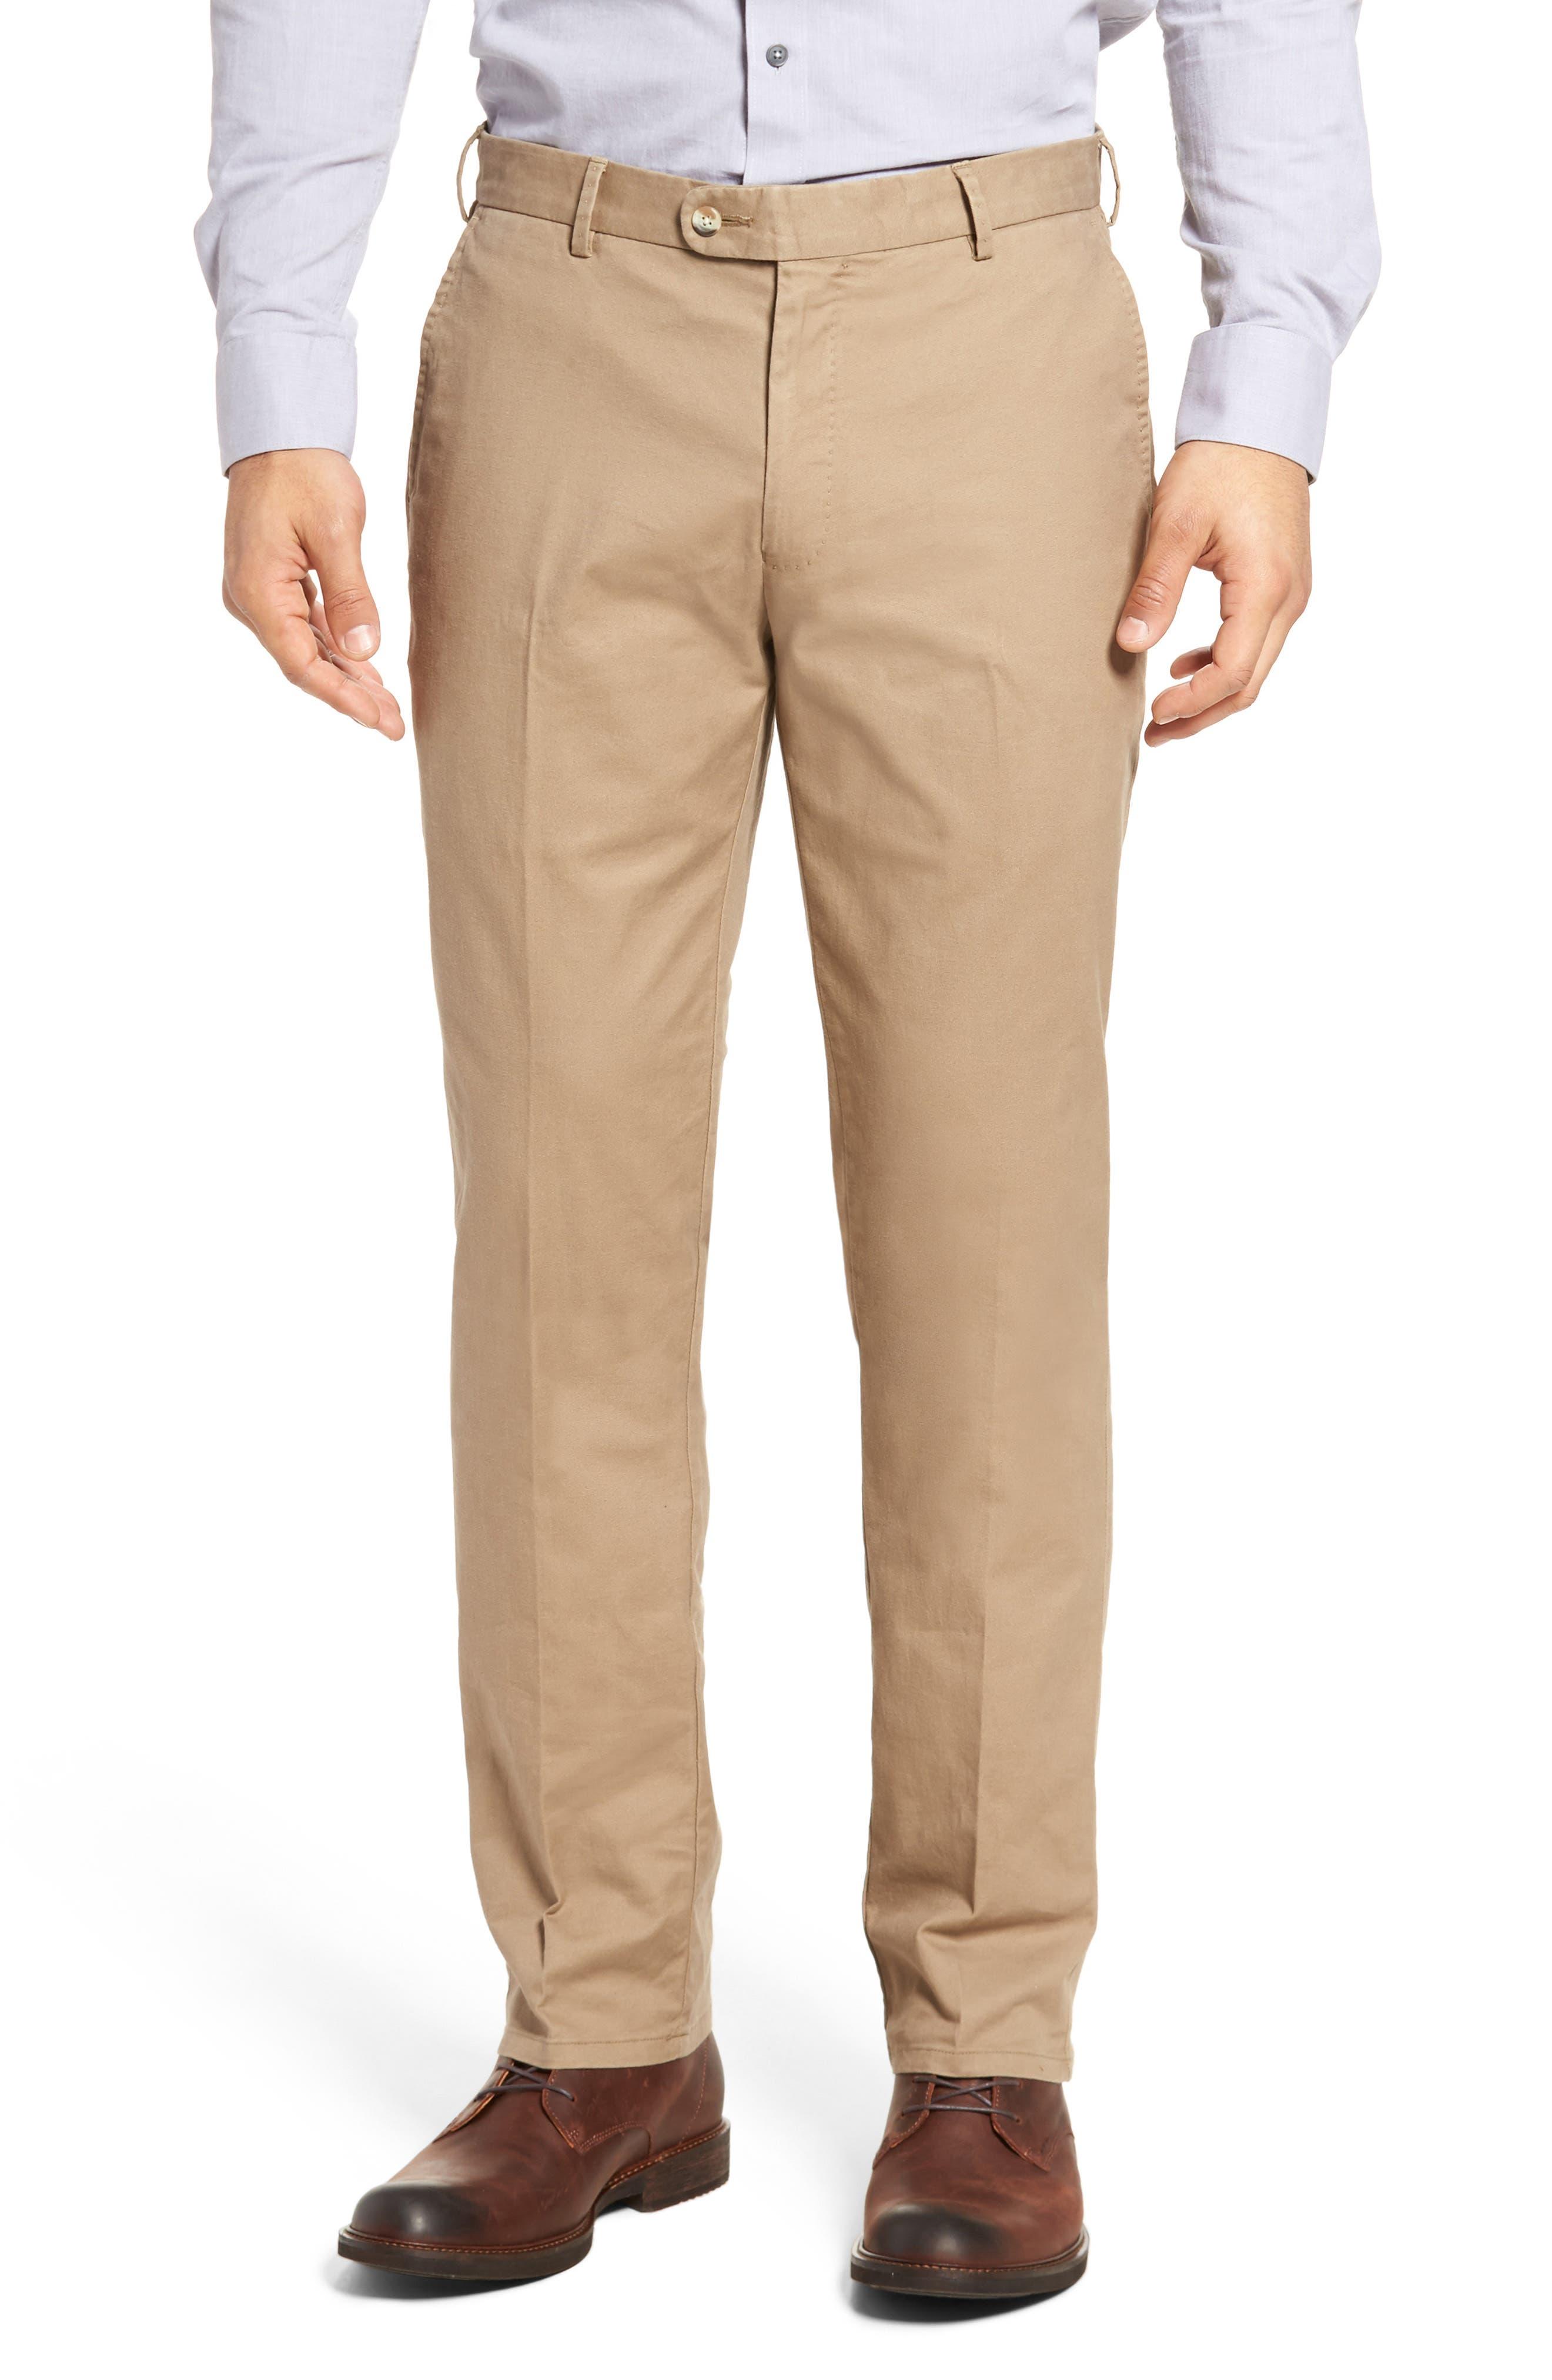 PETER MILLAR Twill Pants, Main, color, BRITISH TAN